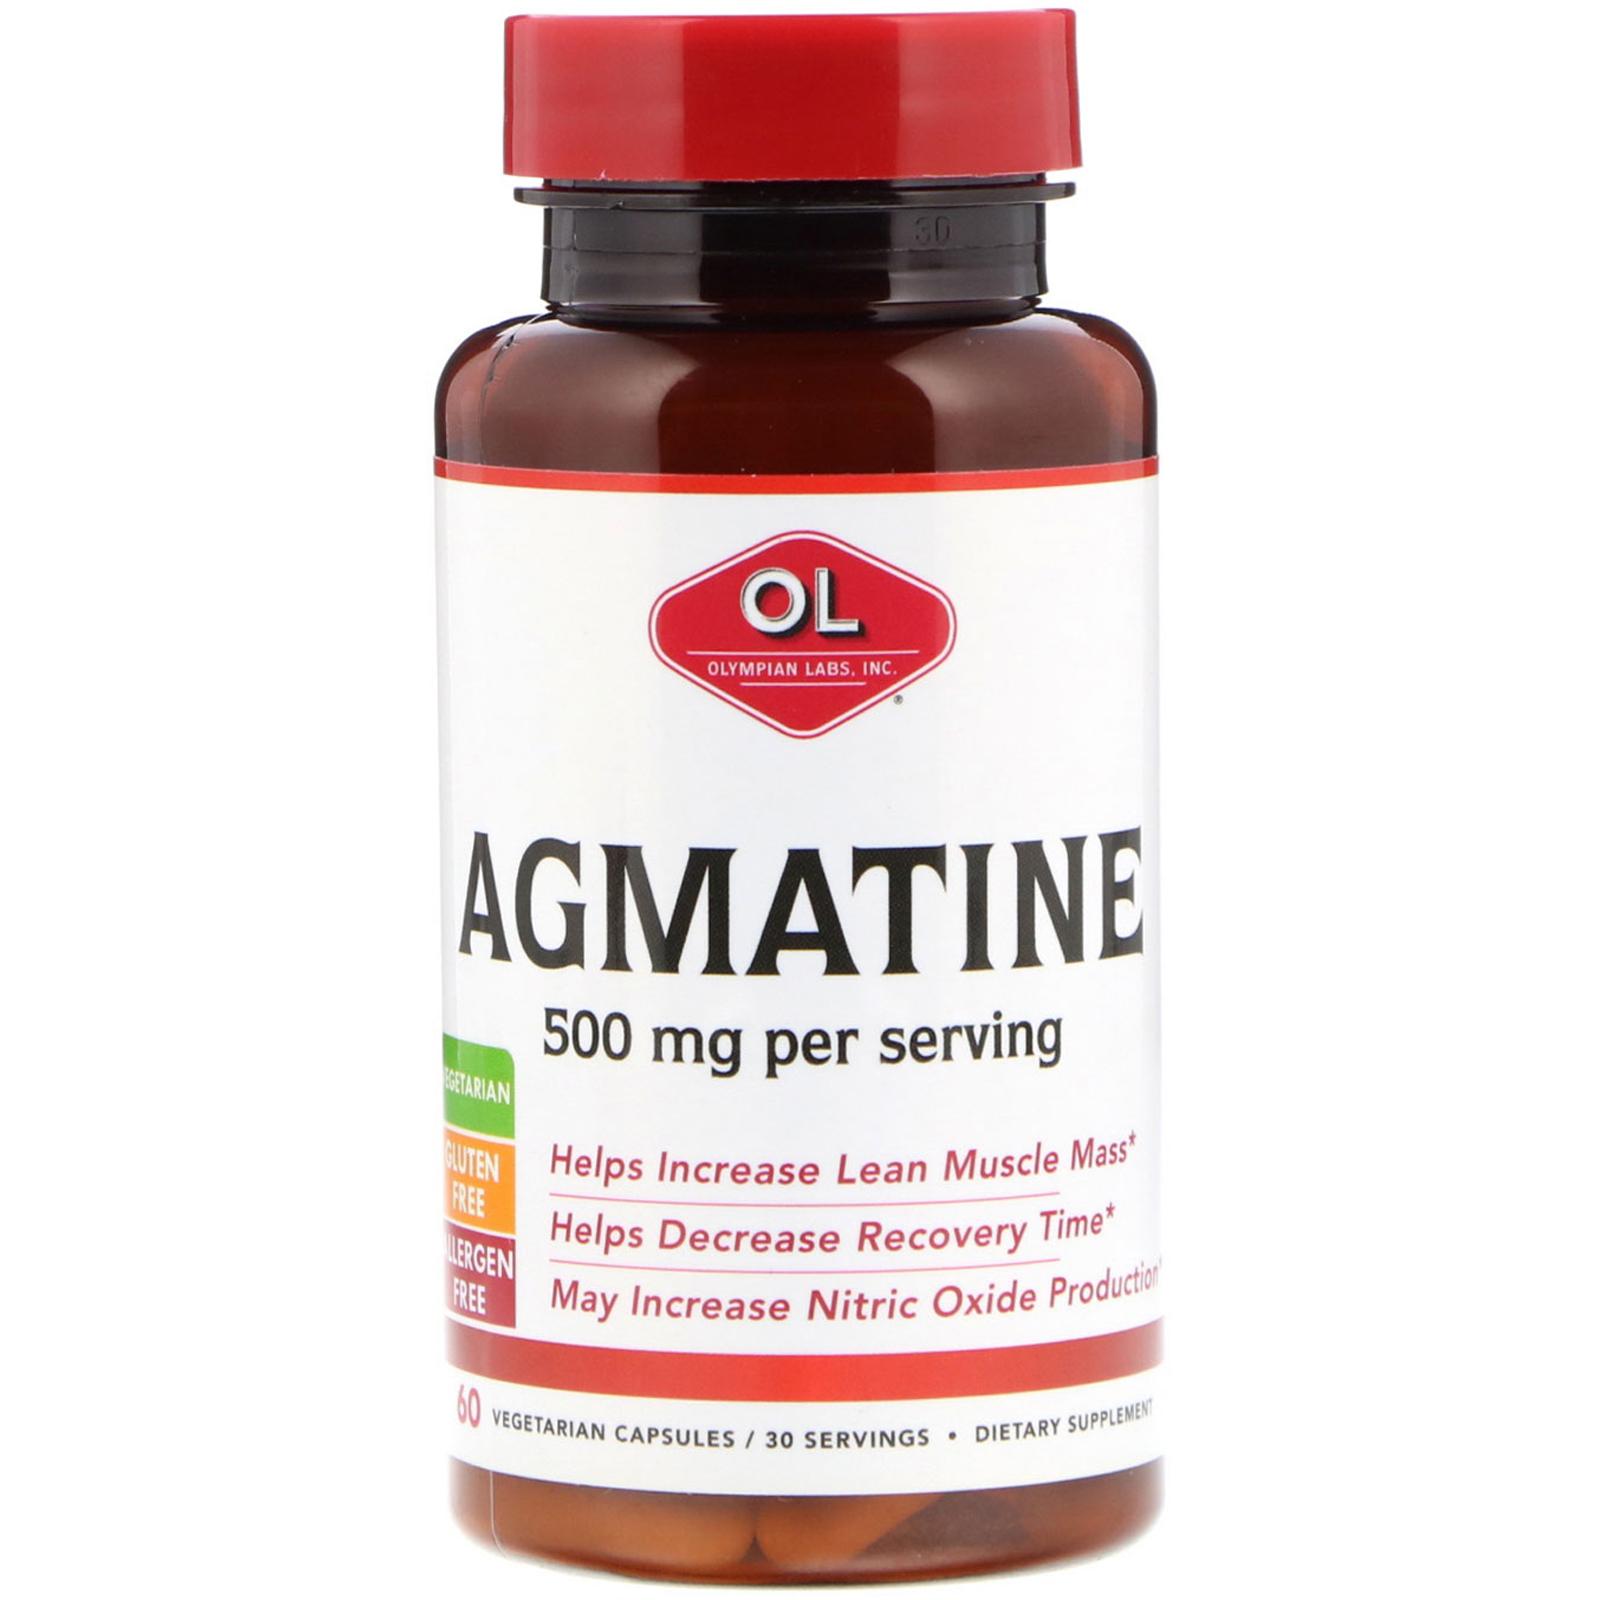 Olympian Labs Inc , Agmatine, 500 mg, 60 Vegetarian Capsules - iHerb com